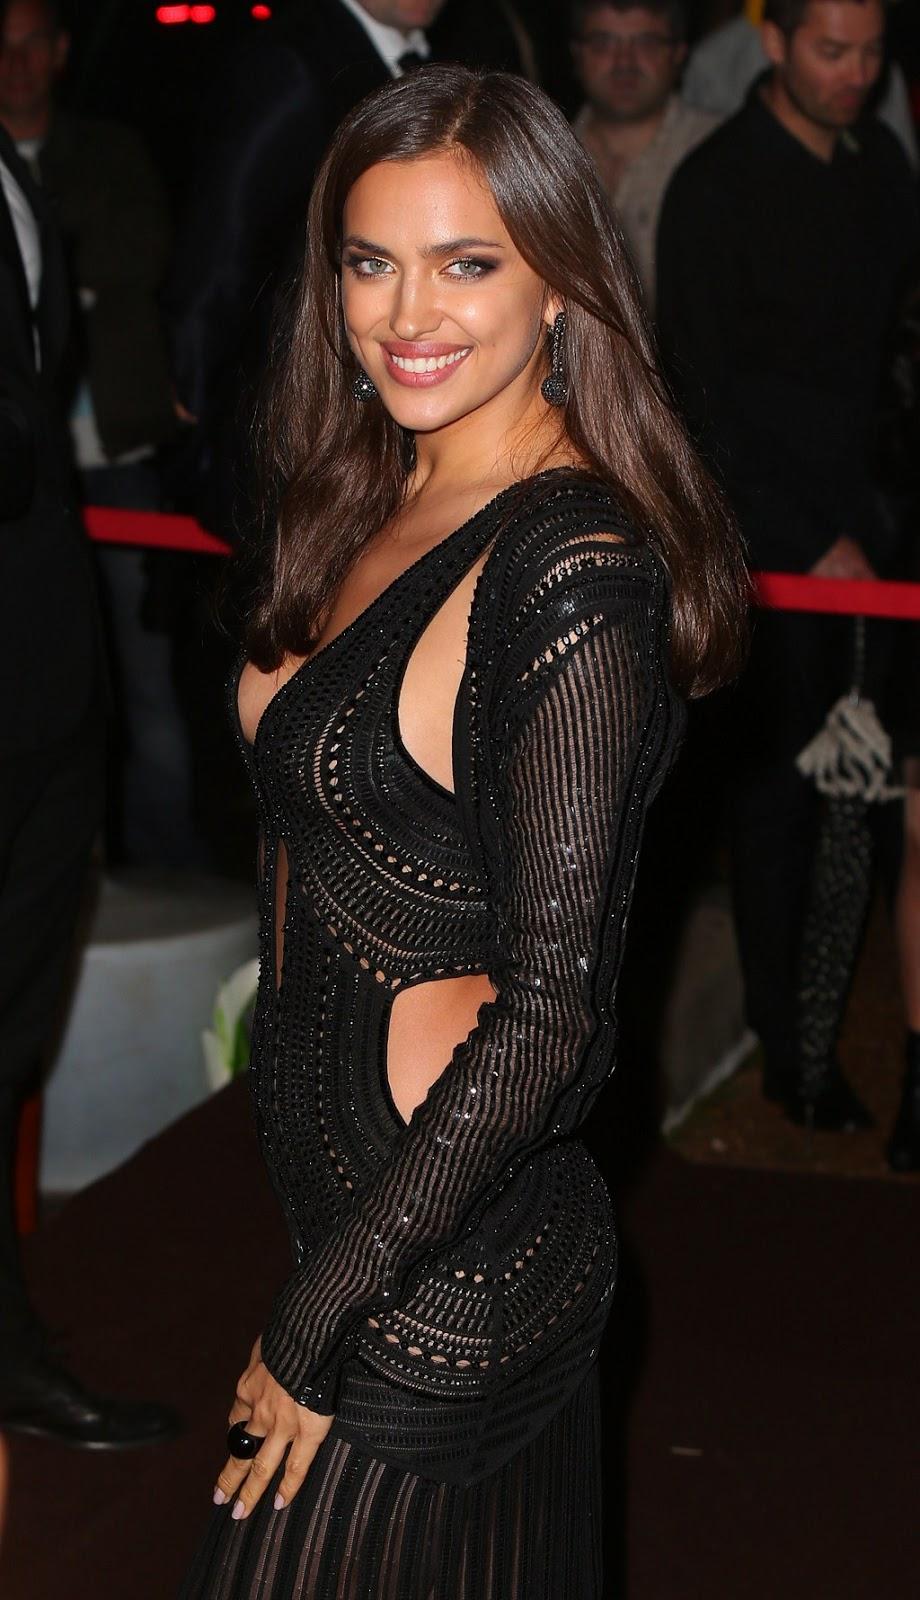 Irina Shayk Looking Hot in black - HD Group Sex